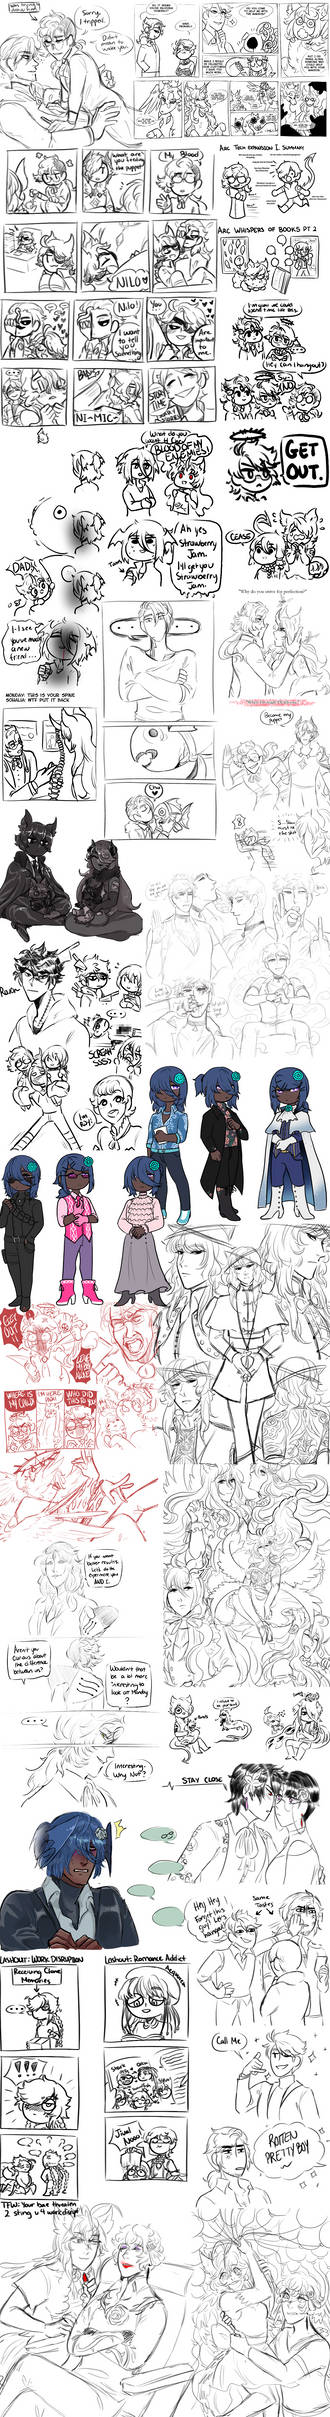 2020 shitpost sketches